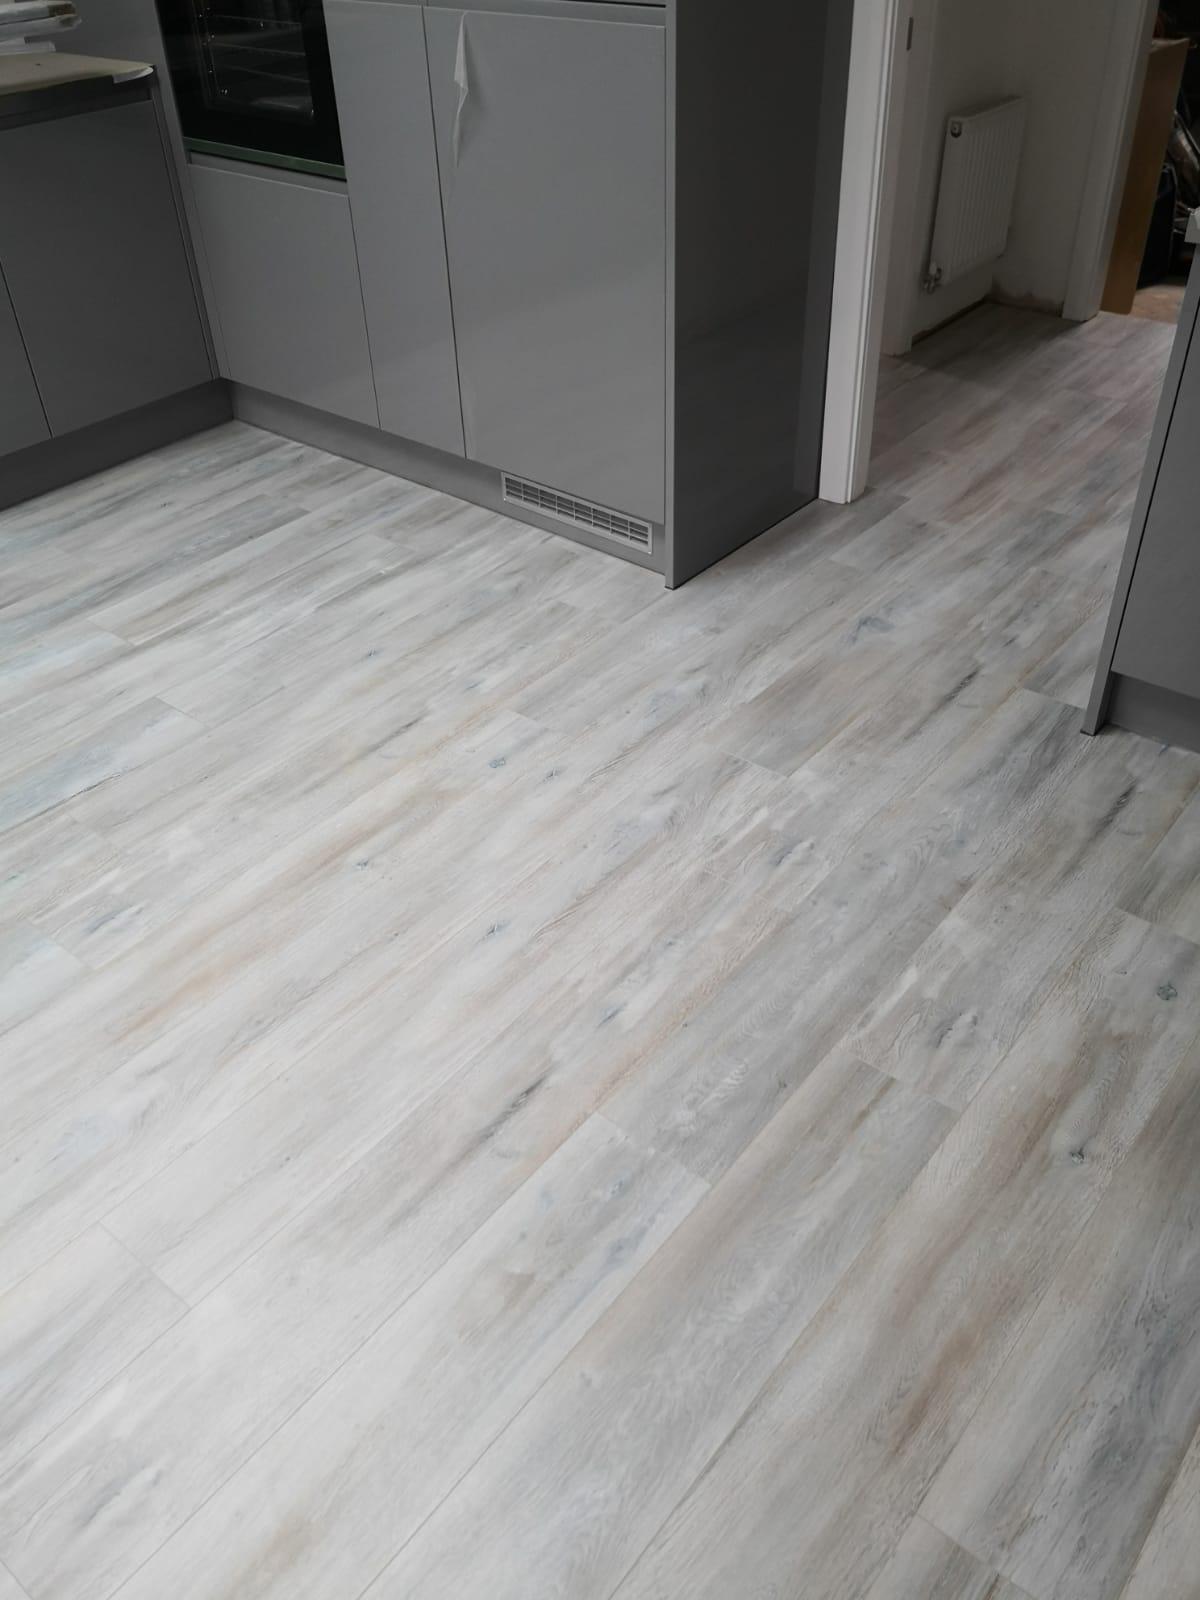 Egger Pro Aqua Plus Classic 8mm Dark Abergele Oak Laminate Flooring EPL068 | The Carpet Shop Southport